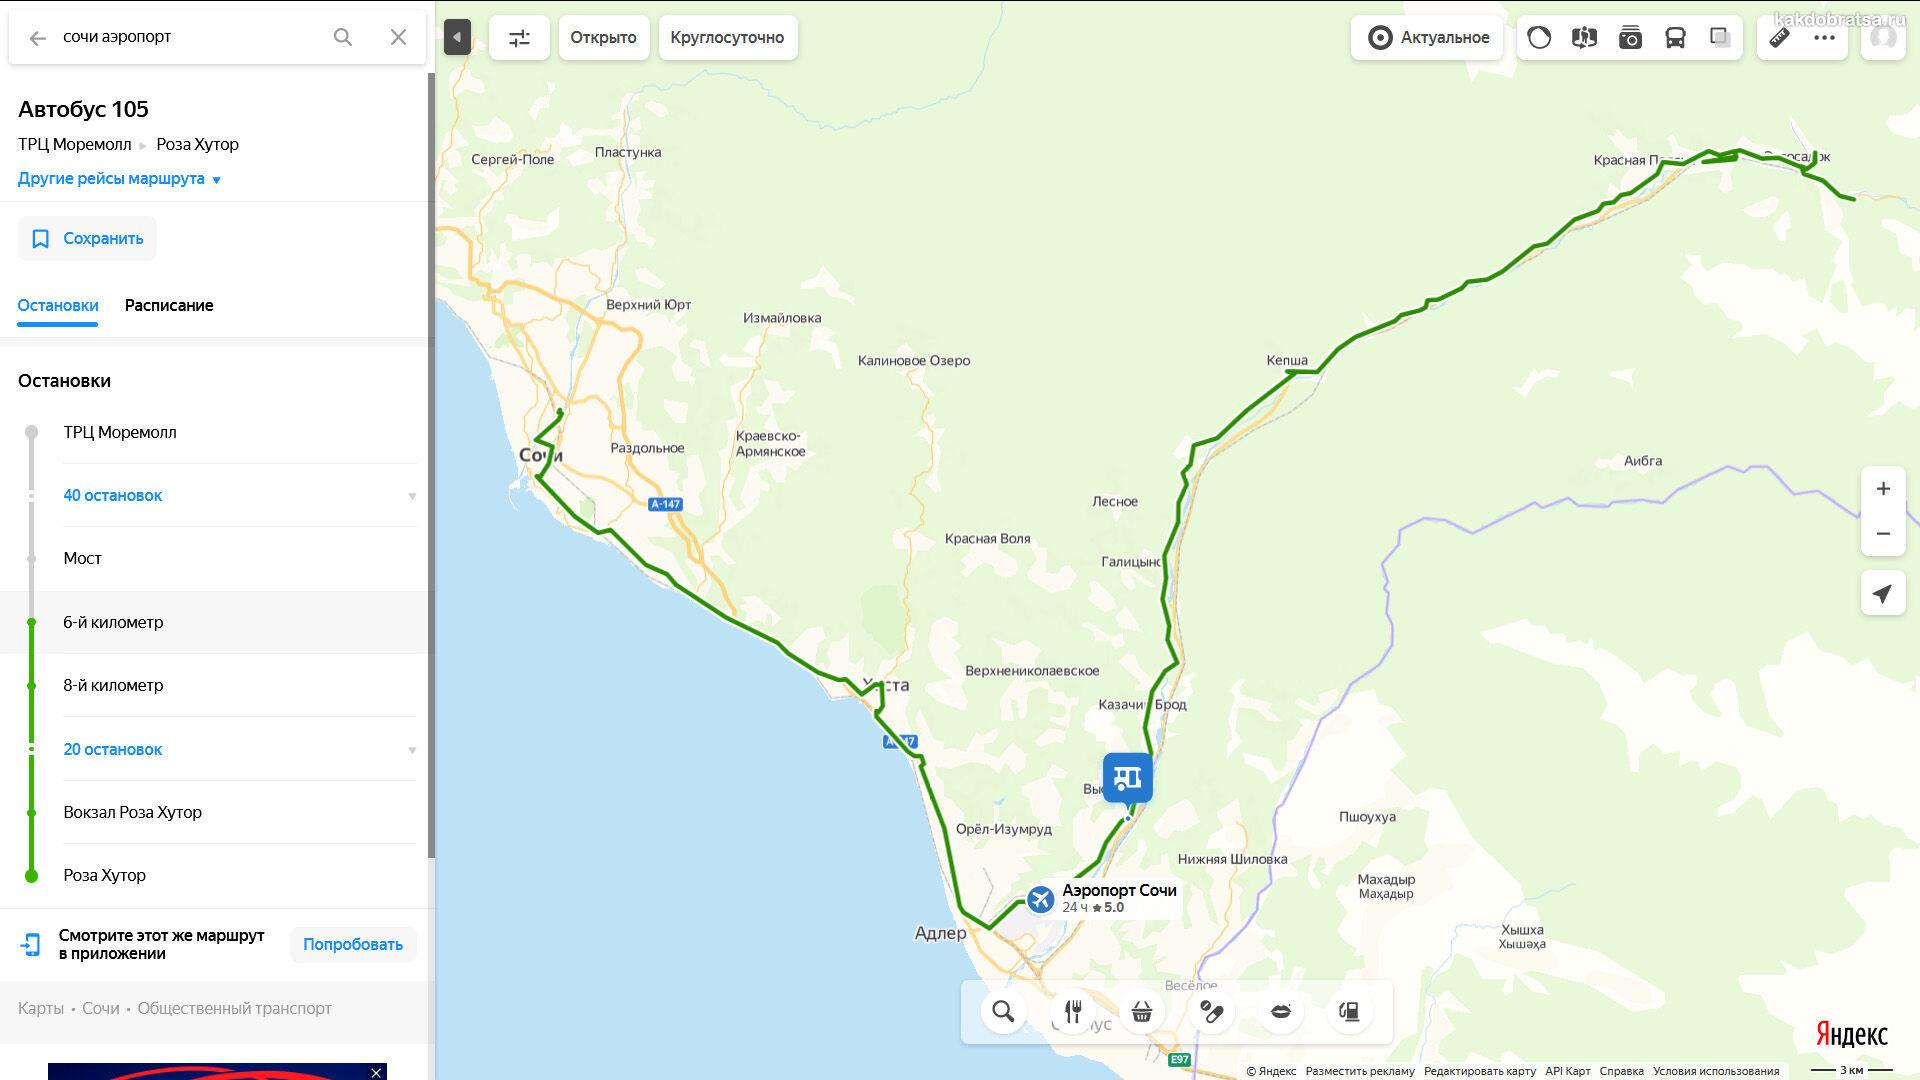 Аэропорт Сочи карта автобуса маршрут 105